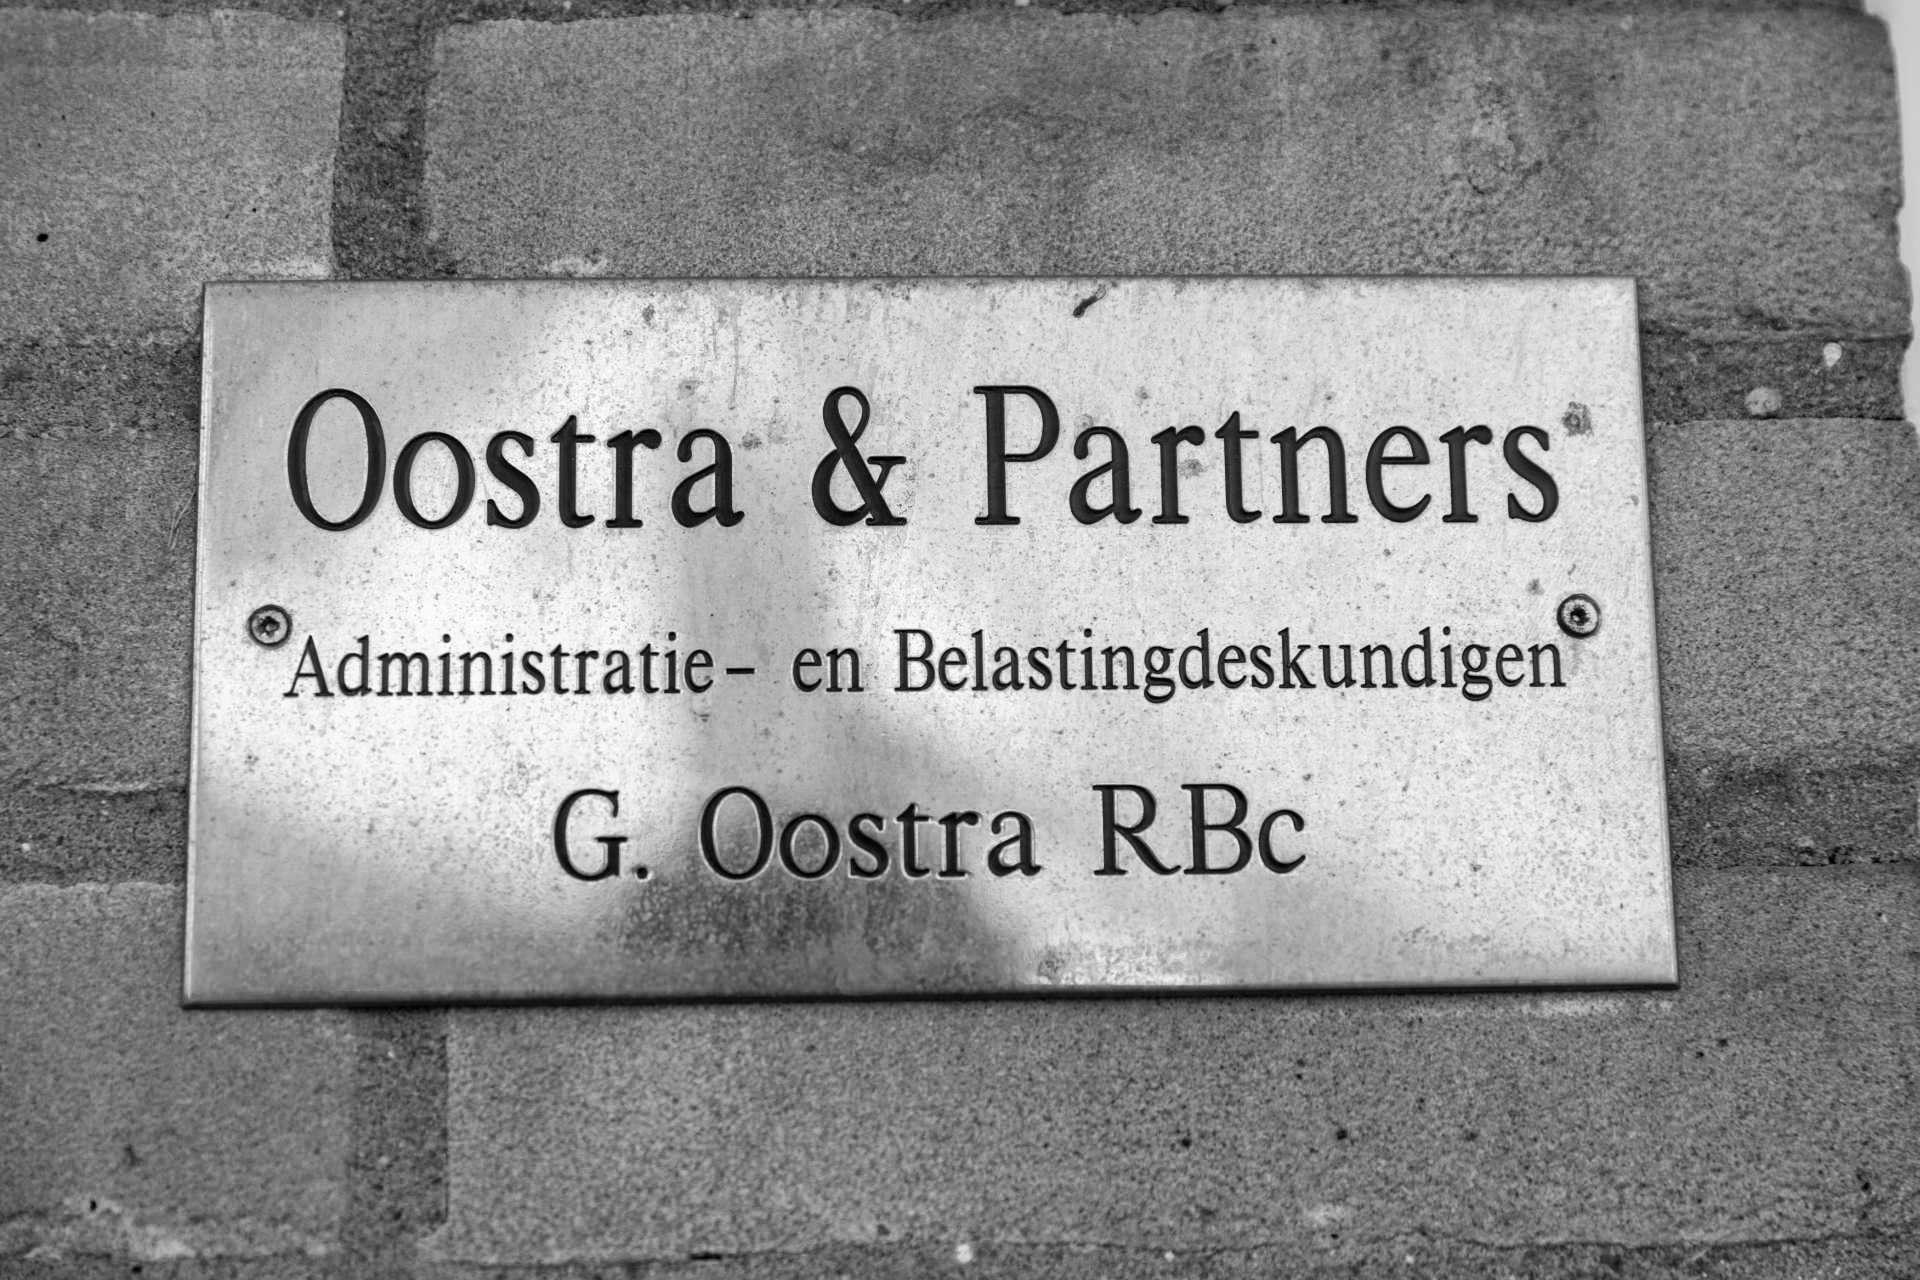 Administratie- Belastingadviseur Oostra & Partners